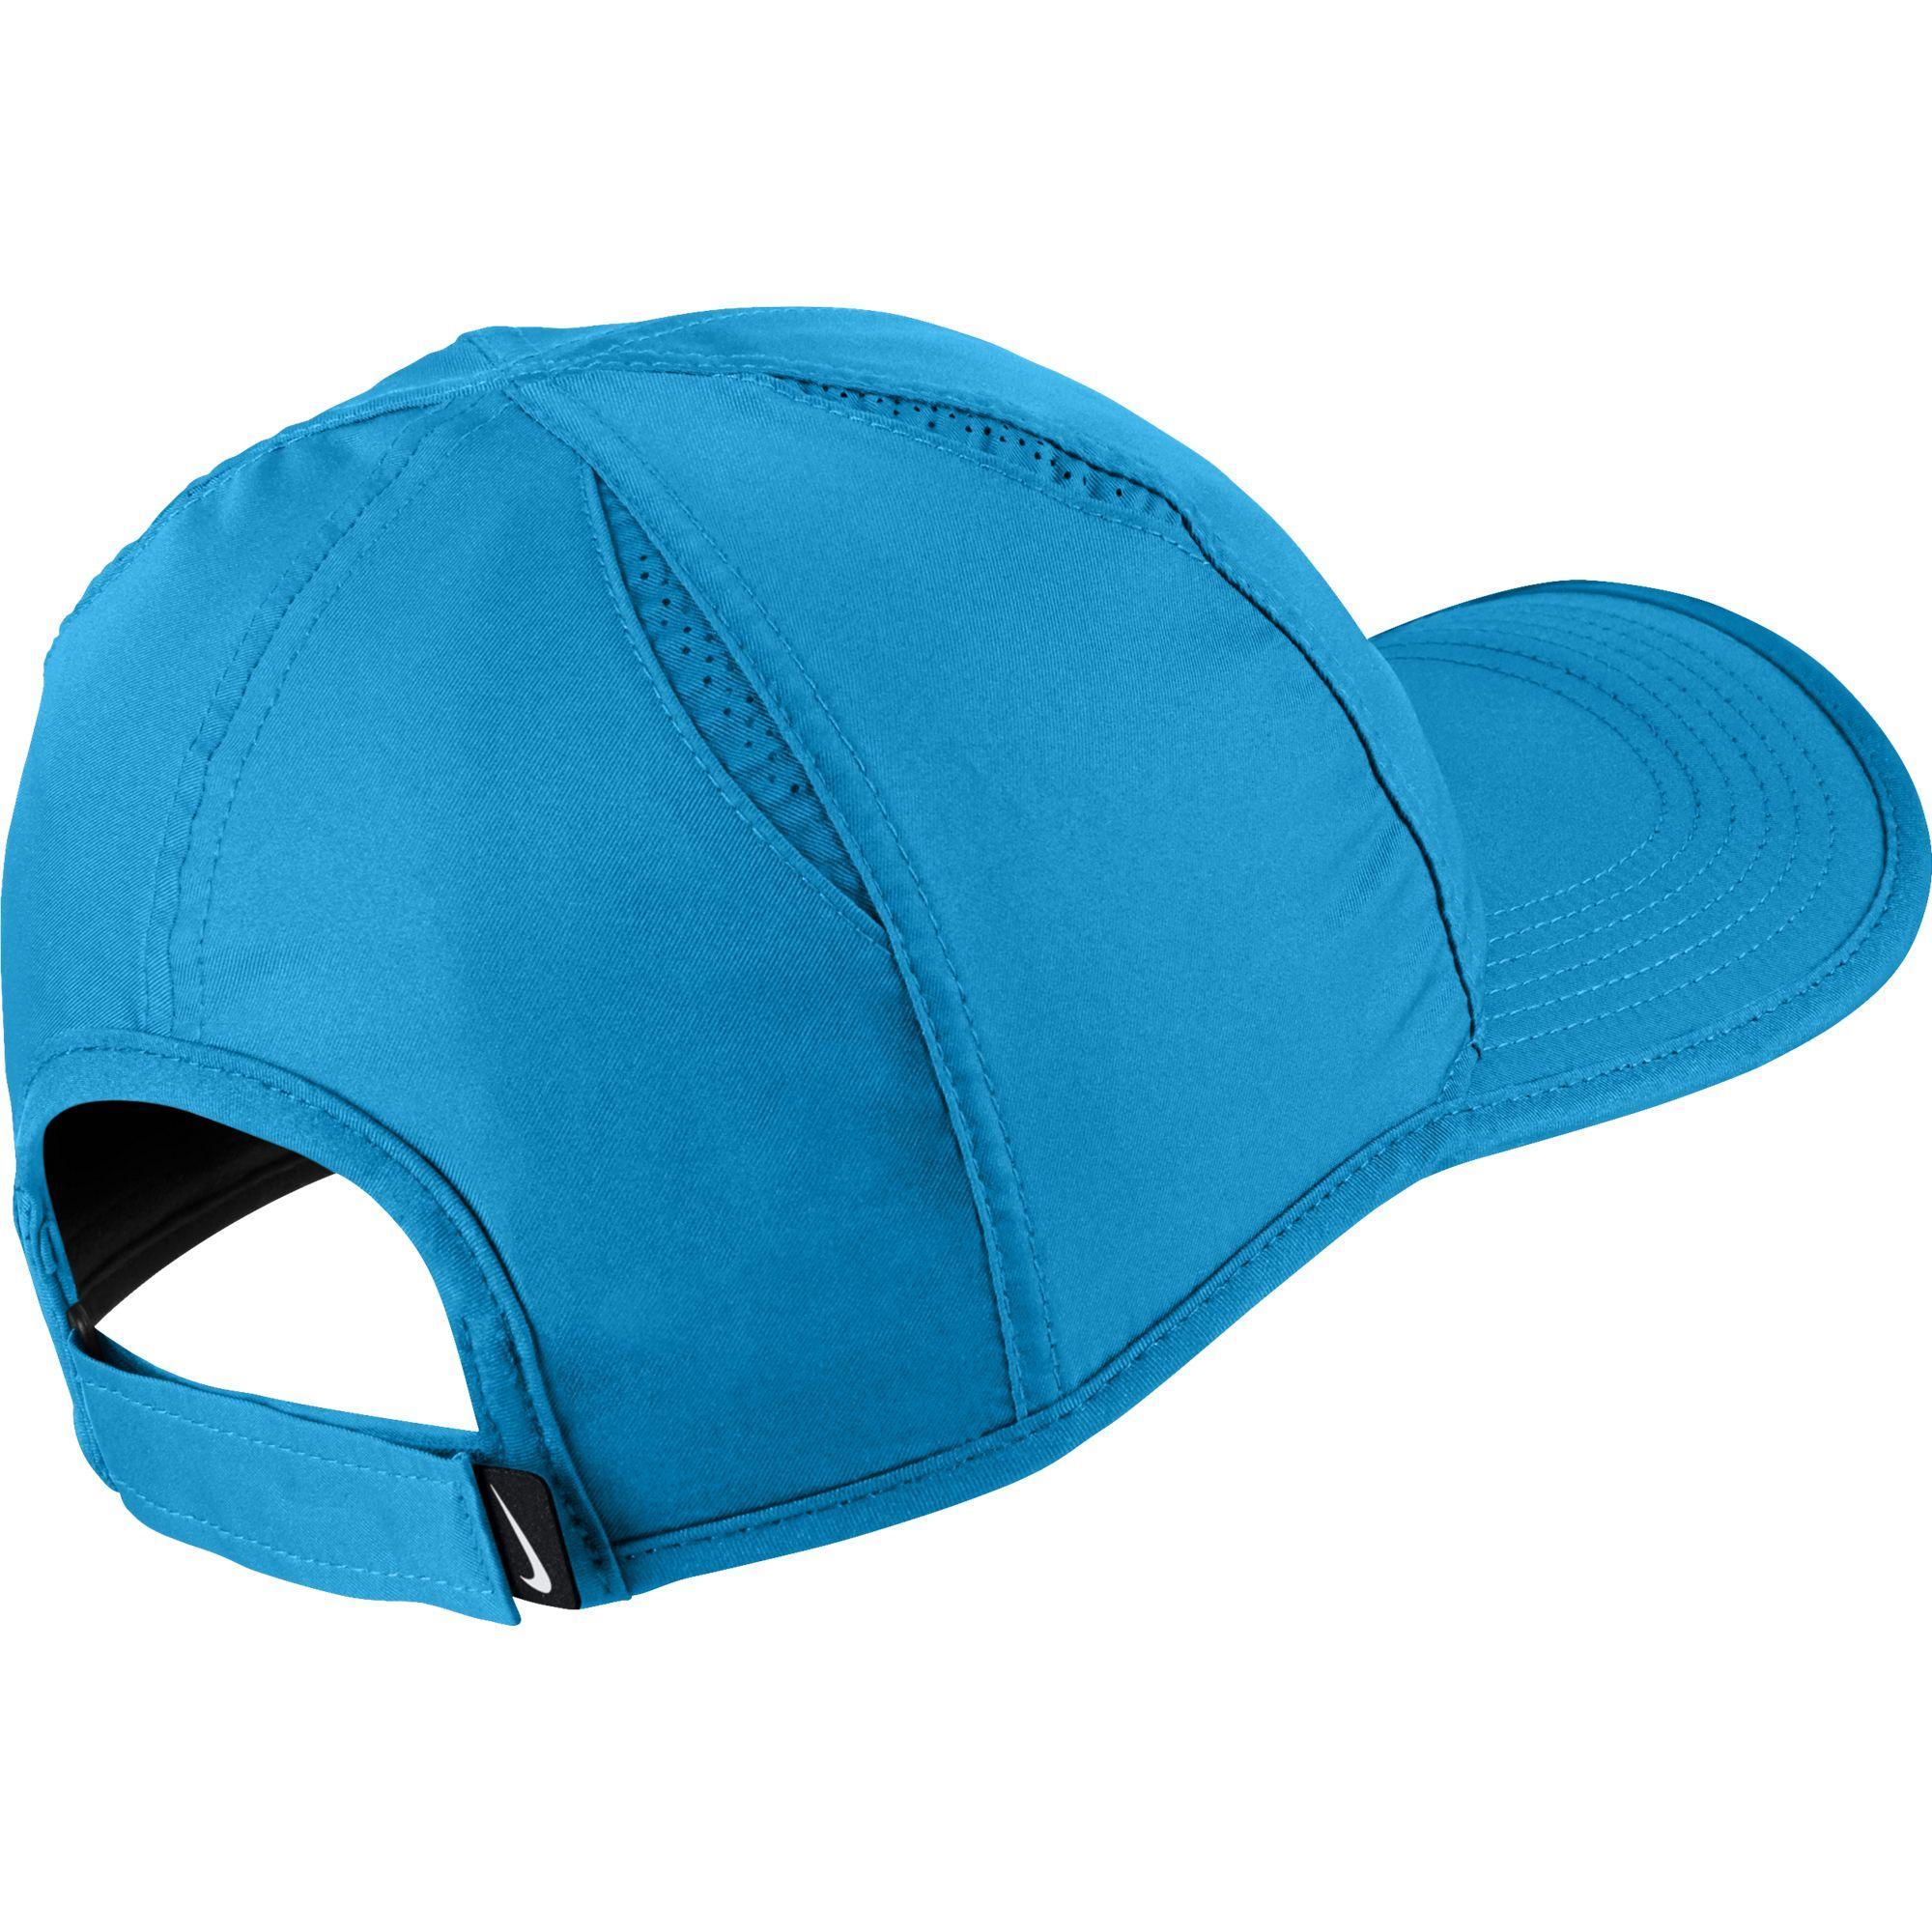 db0cda310d1 Nike Featherlight Adjustable Cap - Equator Blue - Tennisnuts.com